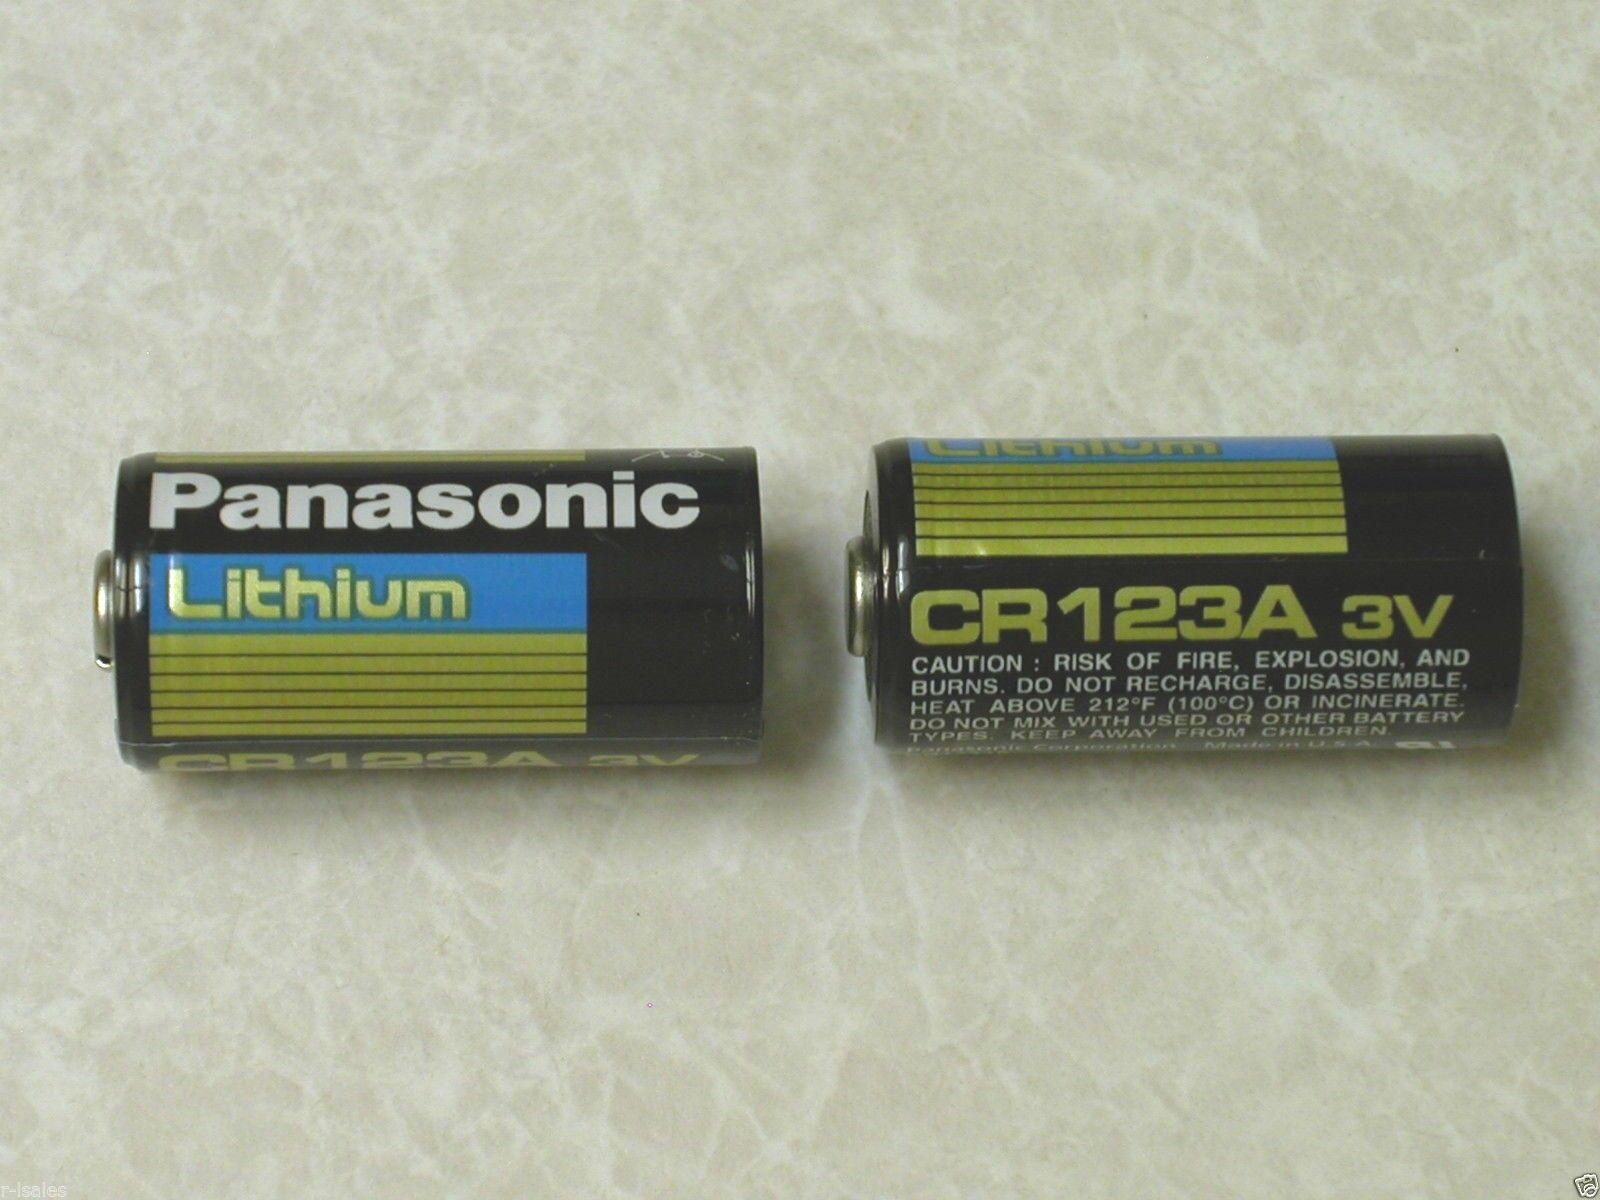 4 PANASONIC CR123A 123 SF123A BATTERY CR123 LITHIUM 1550 mah PHOTO EXPIRE 2024